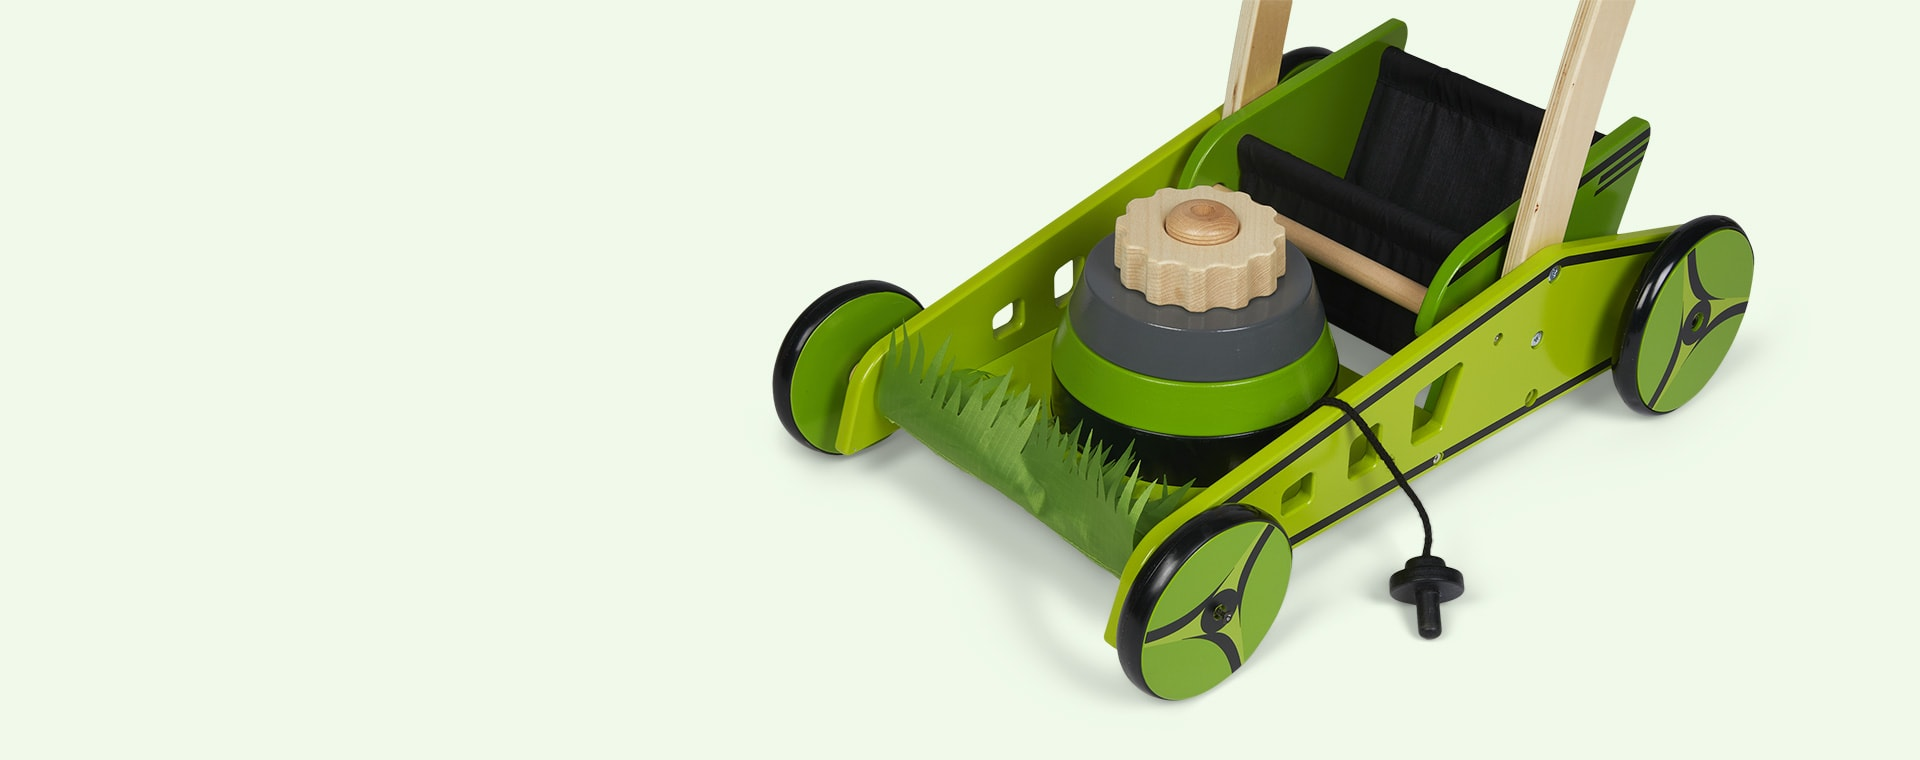 Multi Legler Toys Lawn Mower Baby Walker